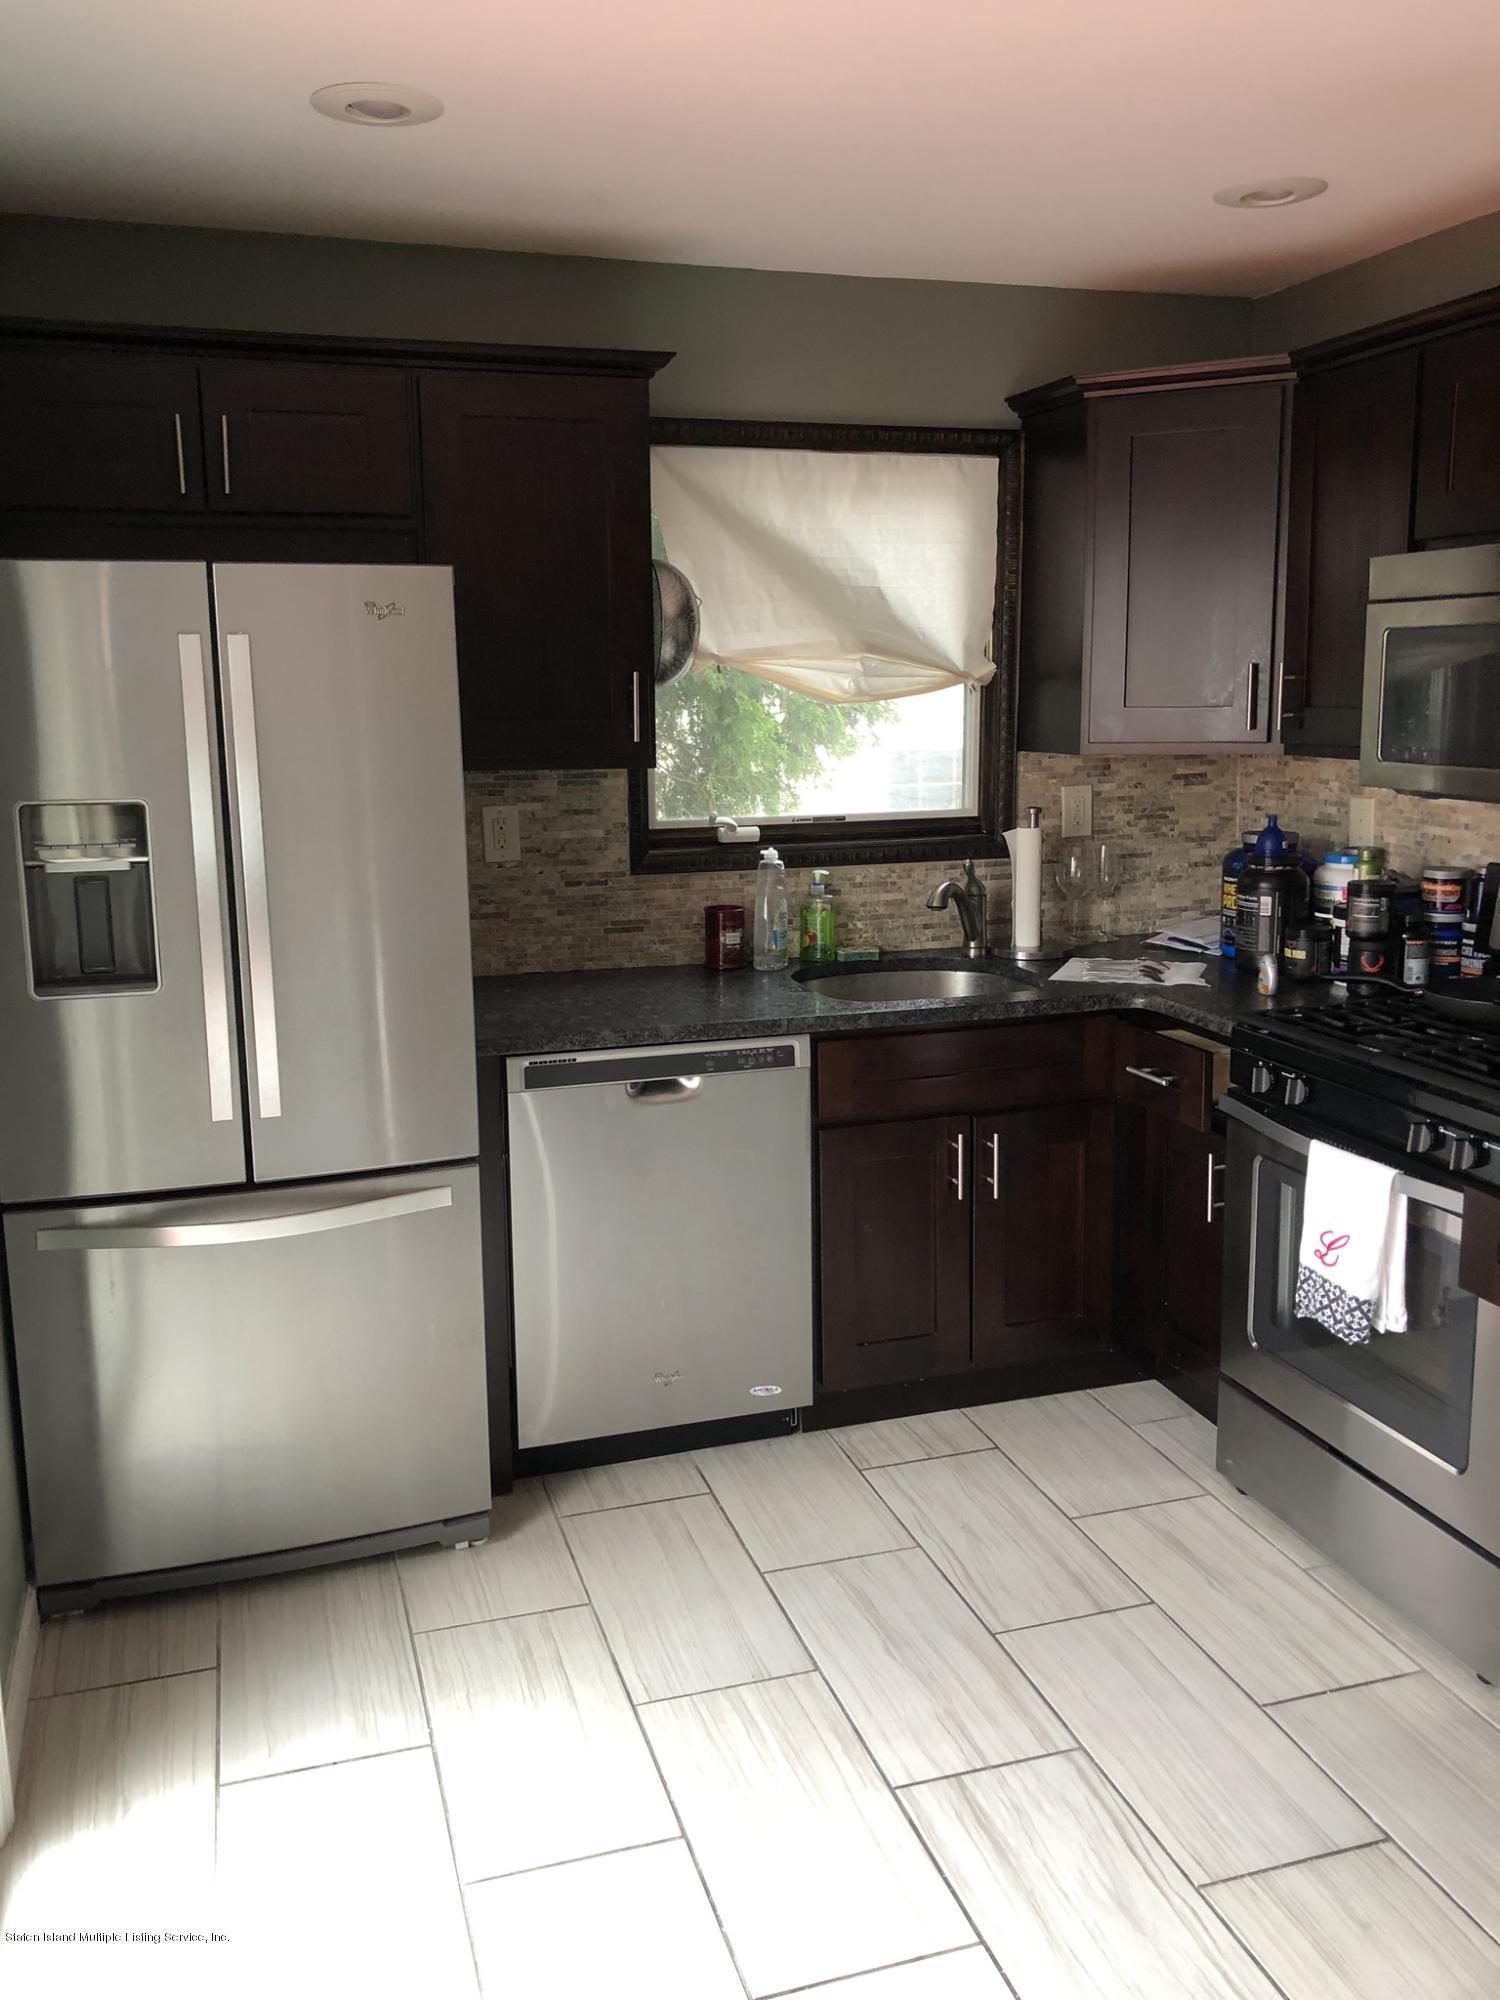 Single Family - Semi-Attached 59 Cranford Street  Staten Island, NY 10308, MLS-1128460-14